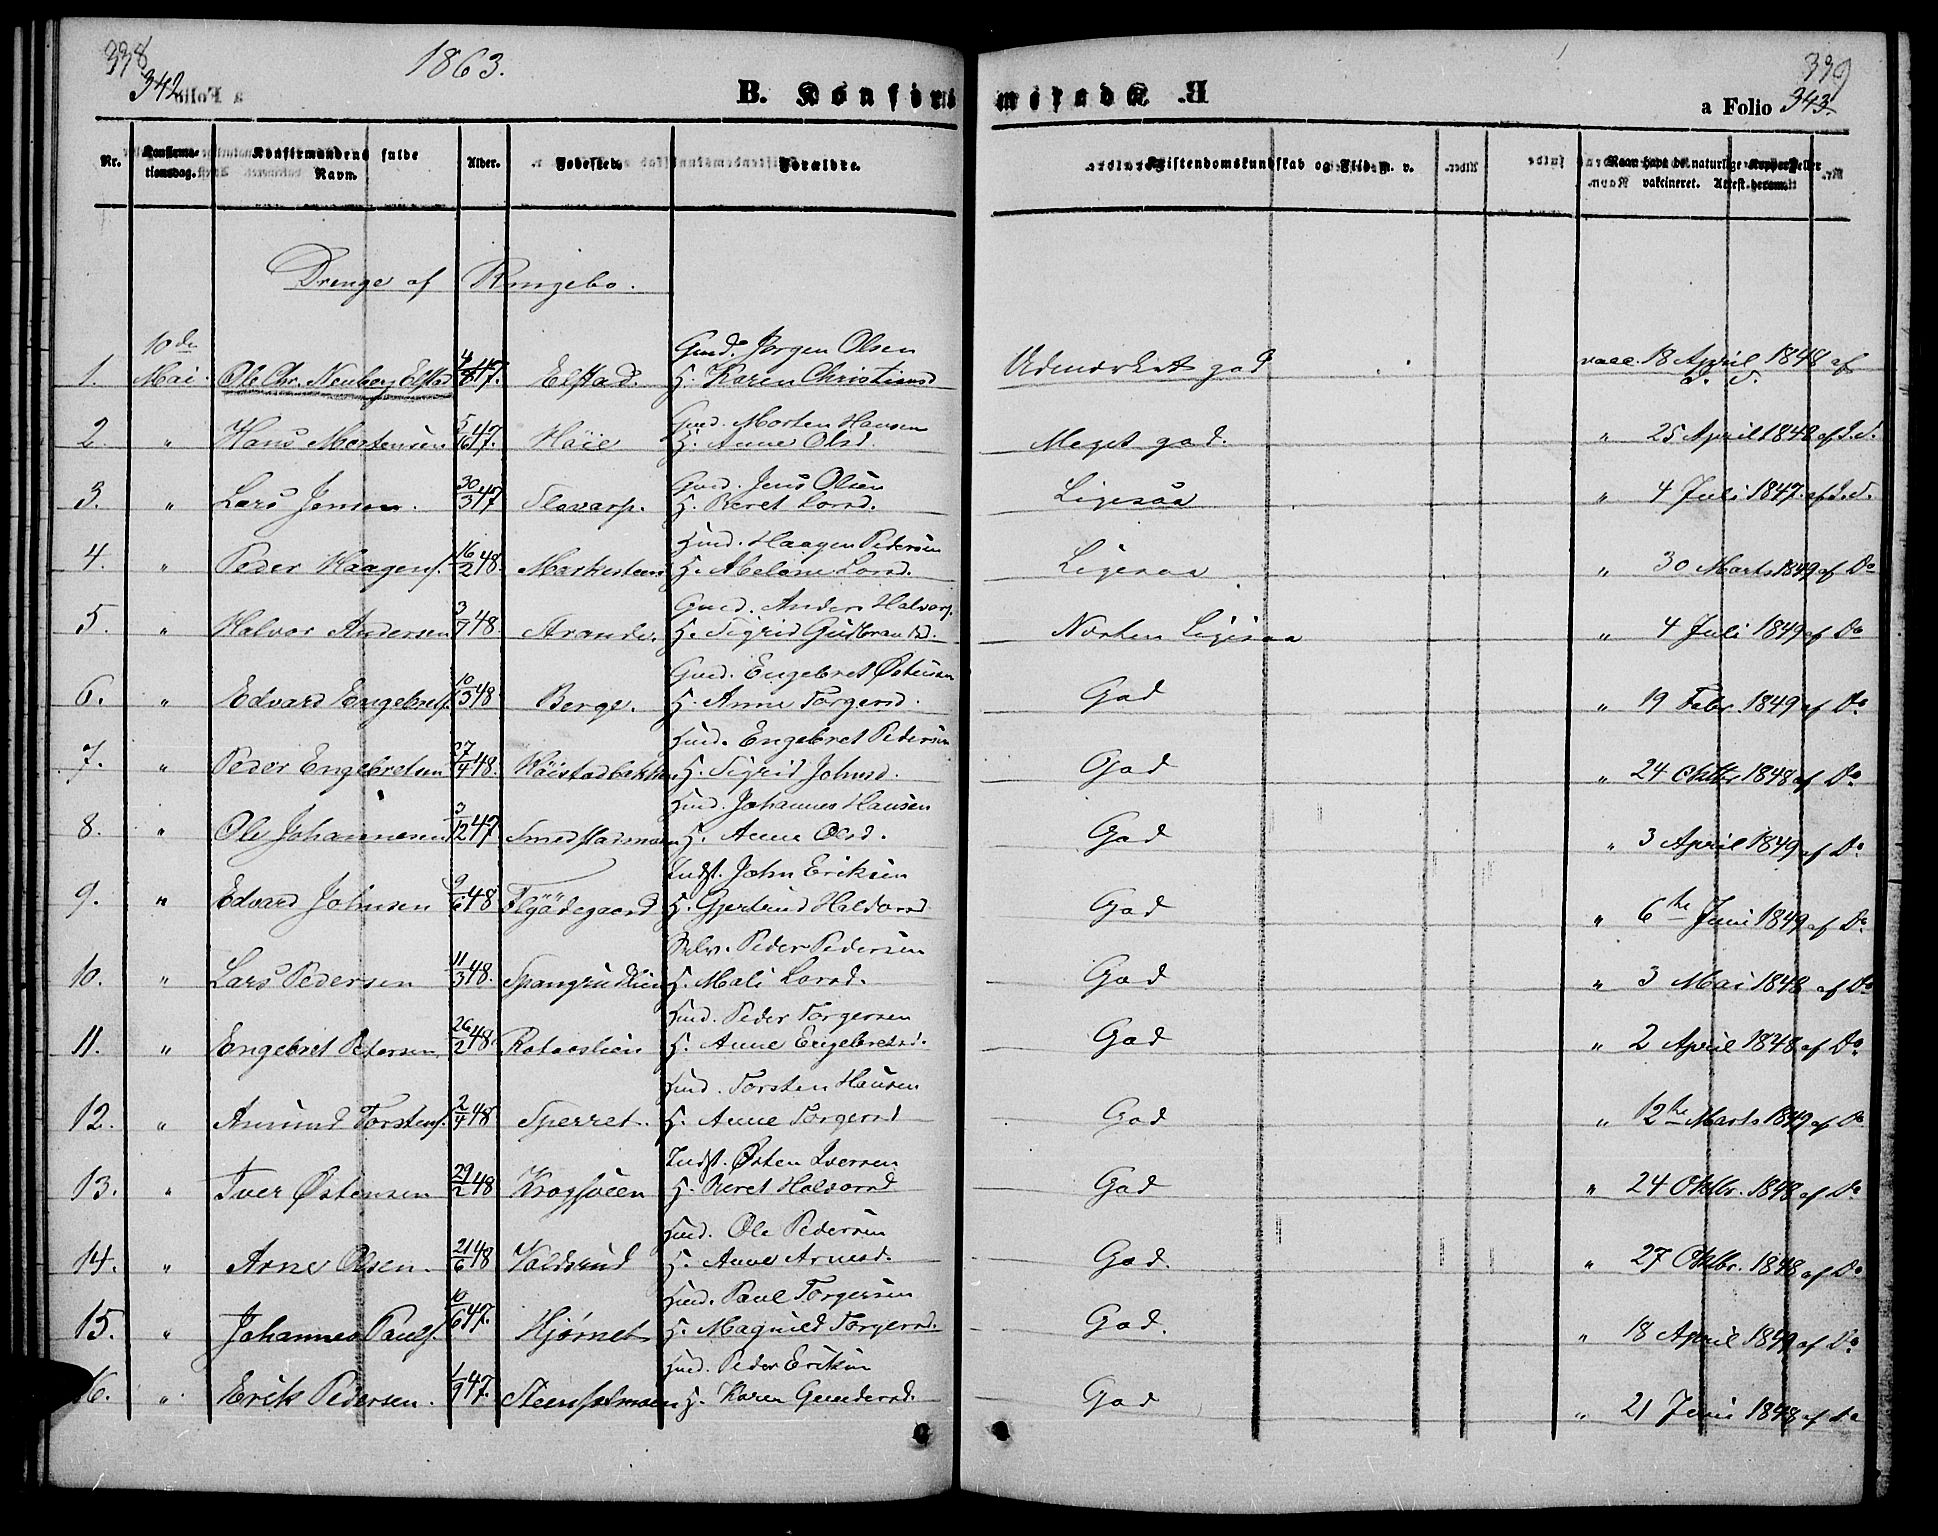 SAH, Ringebu prestekontor, Klokkerbok nr. 3, 1854-1866, s. 338-339